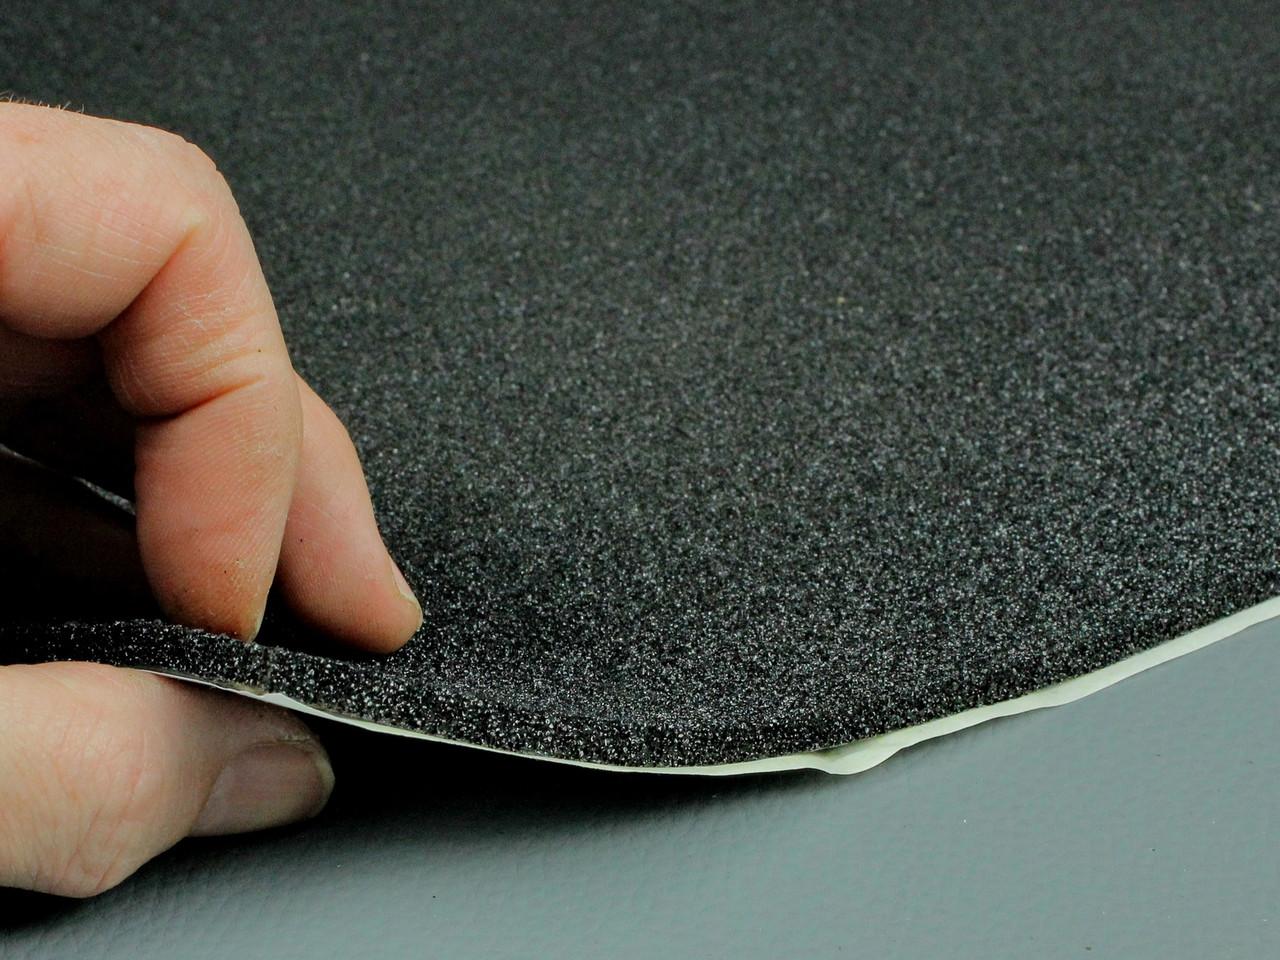 StP битопласт А 5 К - антискрипный, звукопоглощаощий материал, лист 75х100 см, толщина 5мм